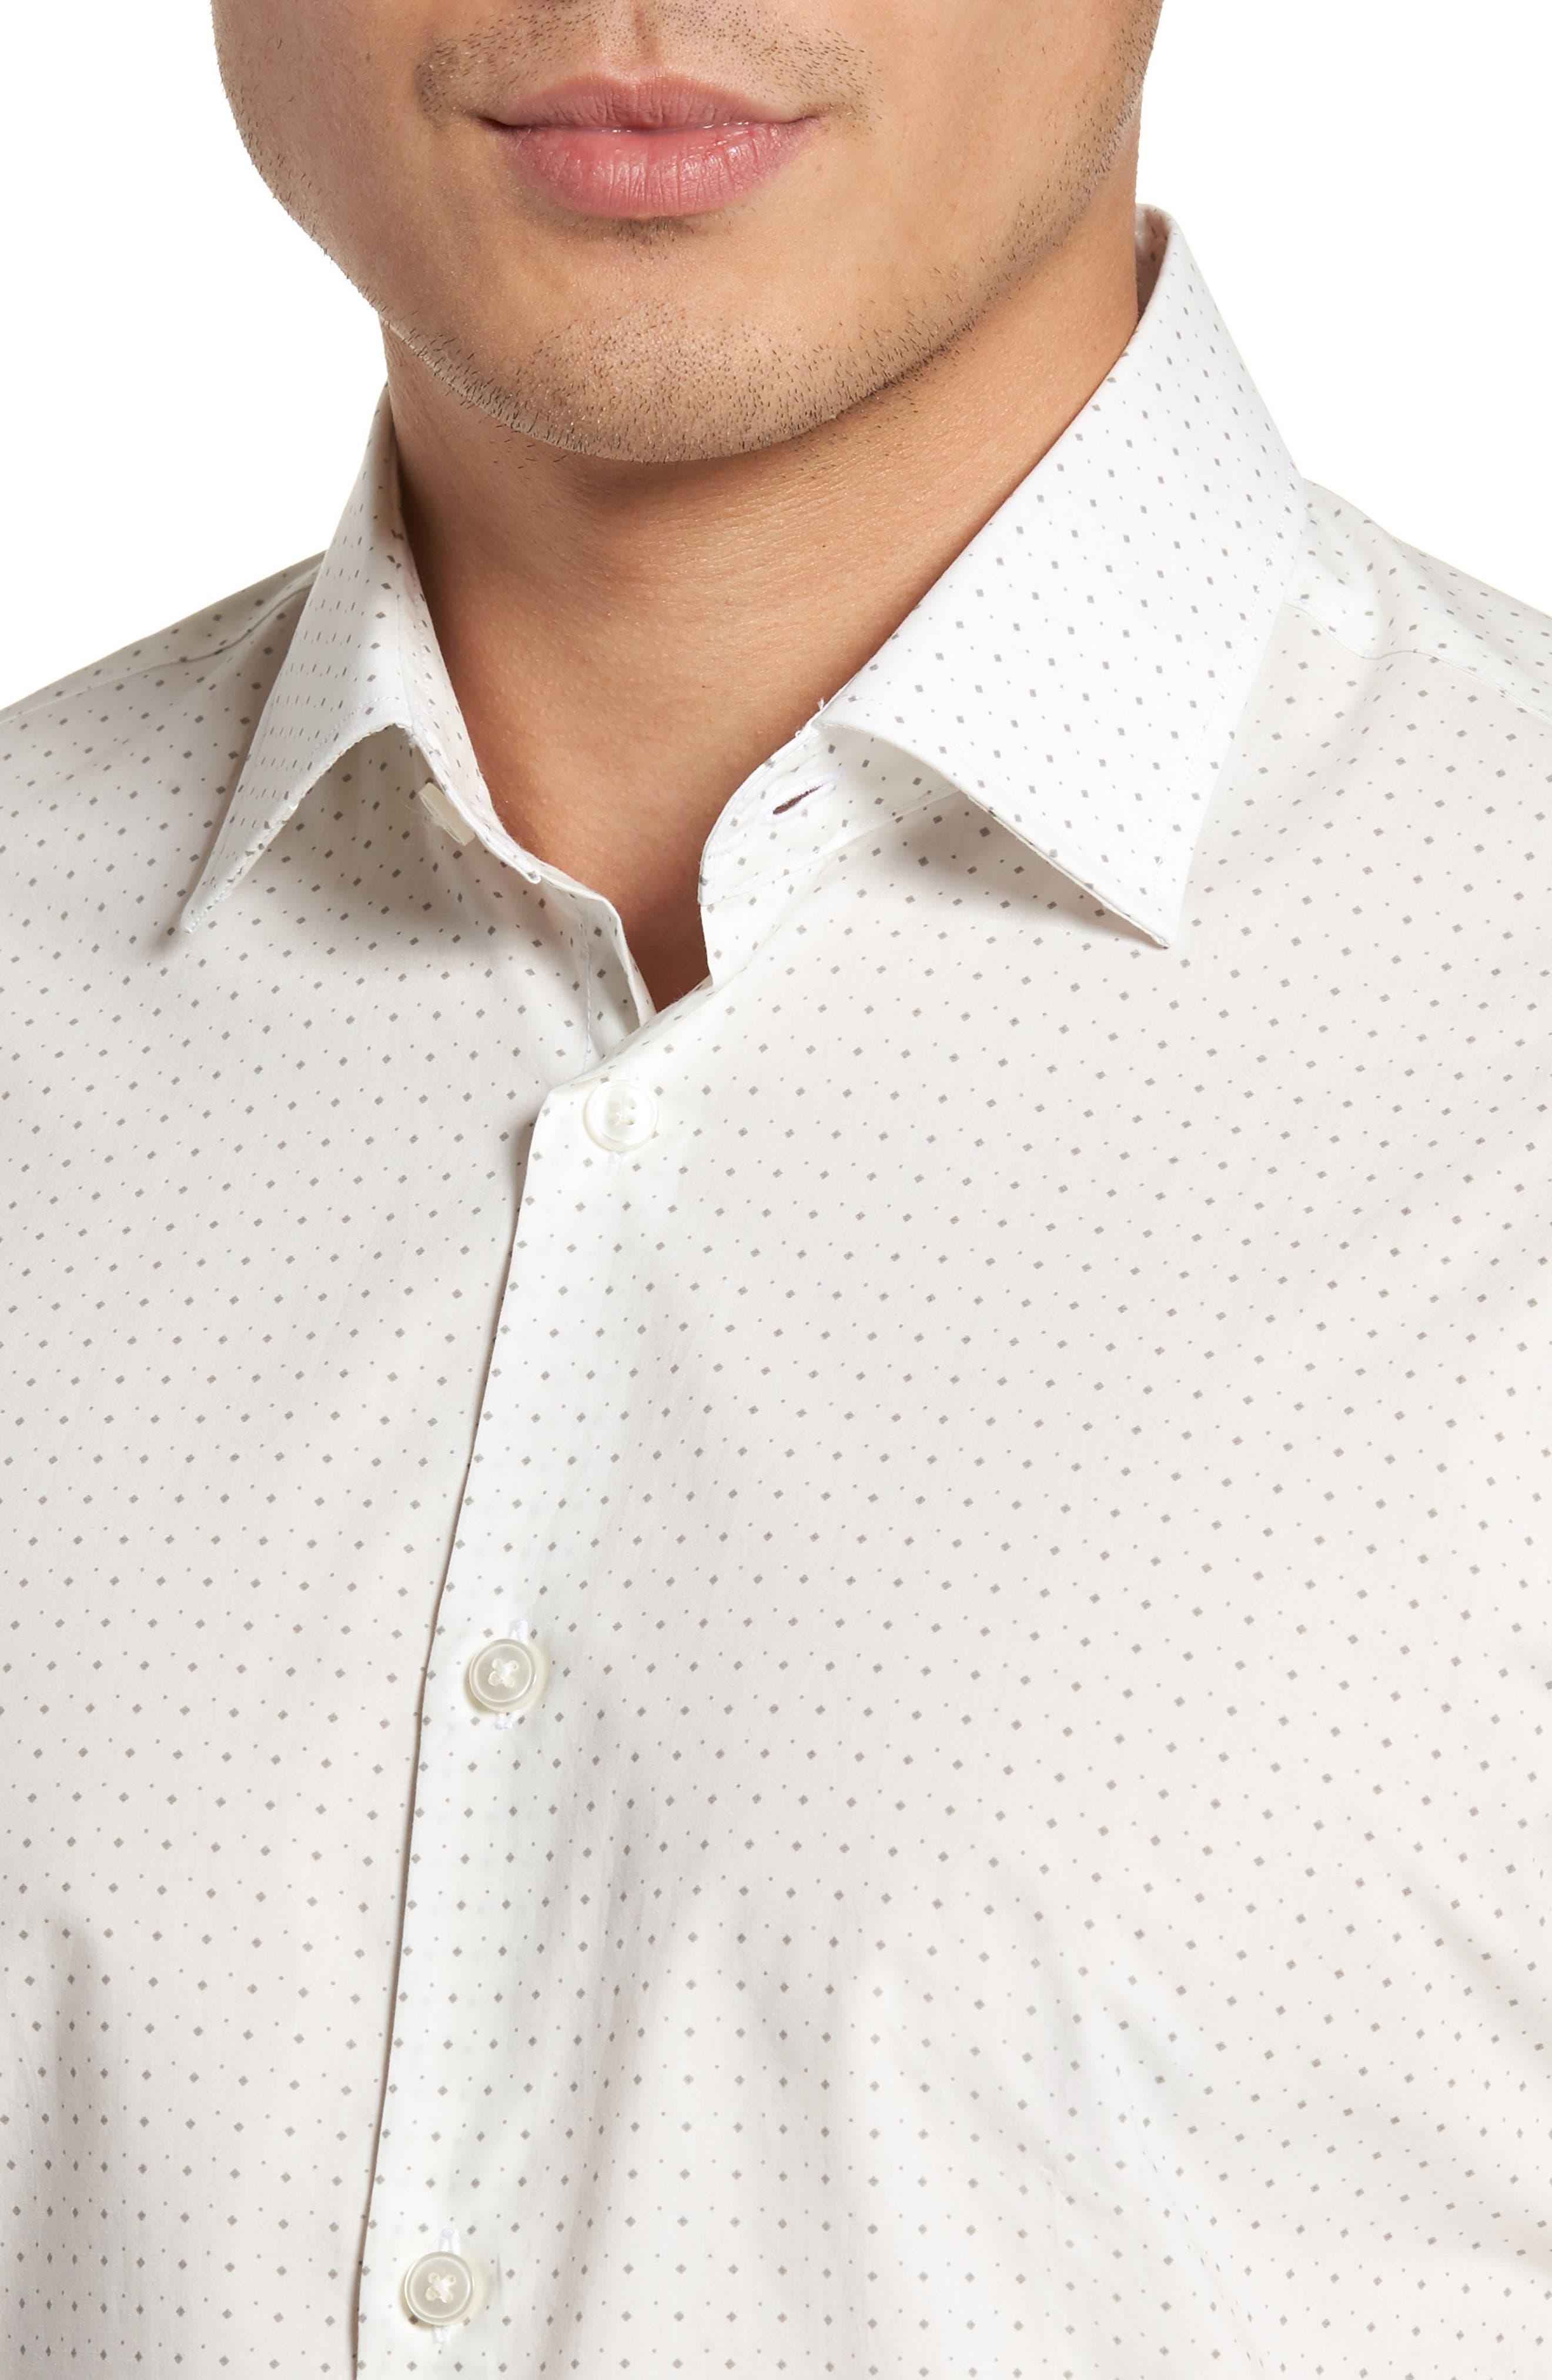 Regular Fit Diamond Dress Shirt,                             Alternate thumbnail 2, color,                             077